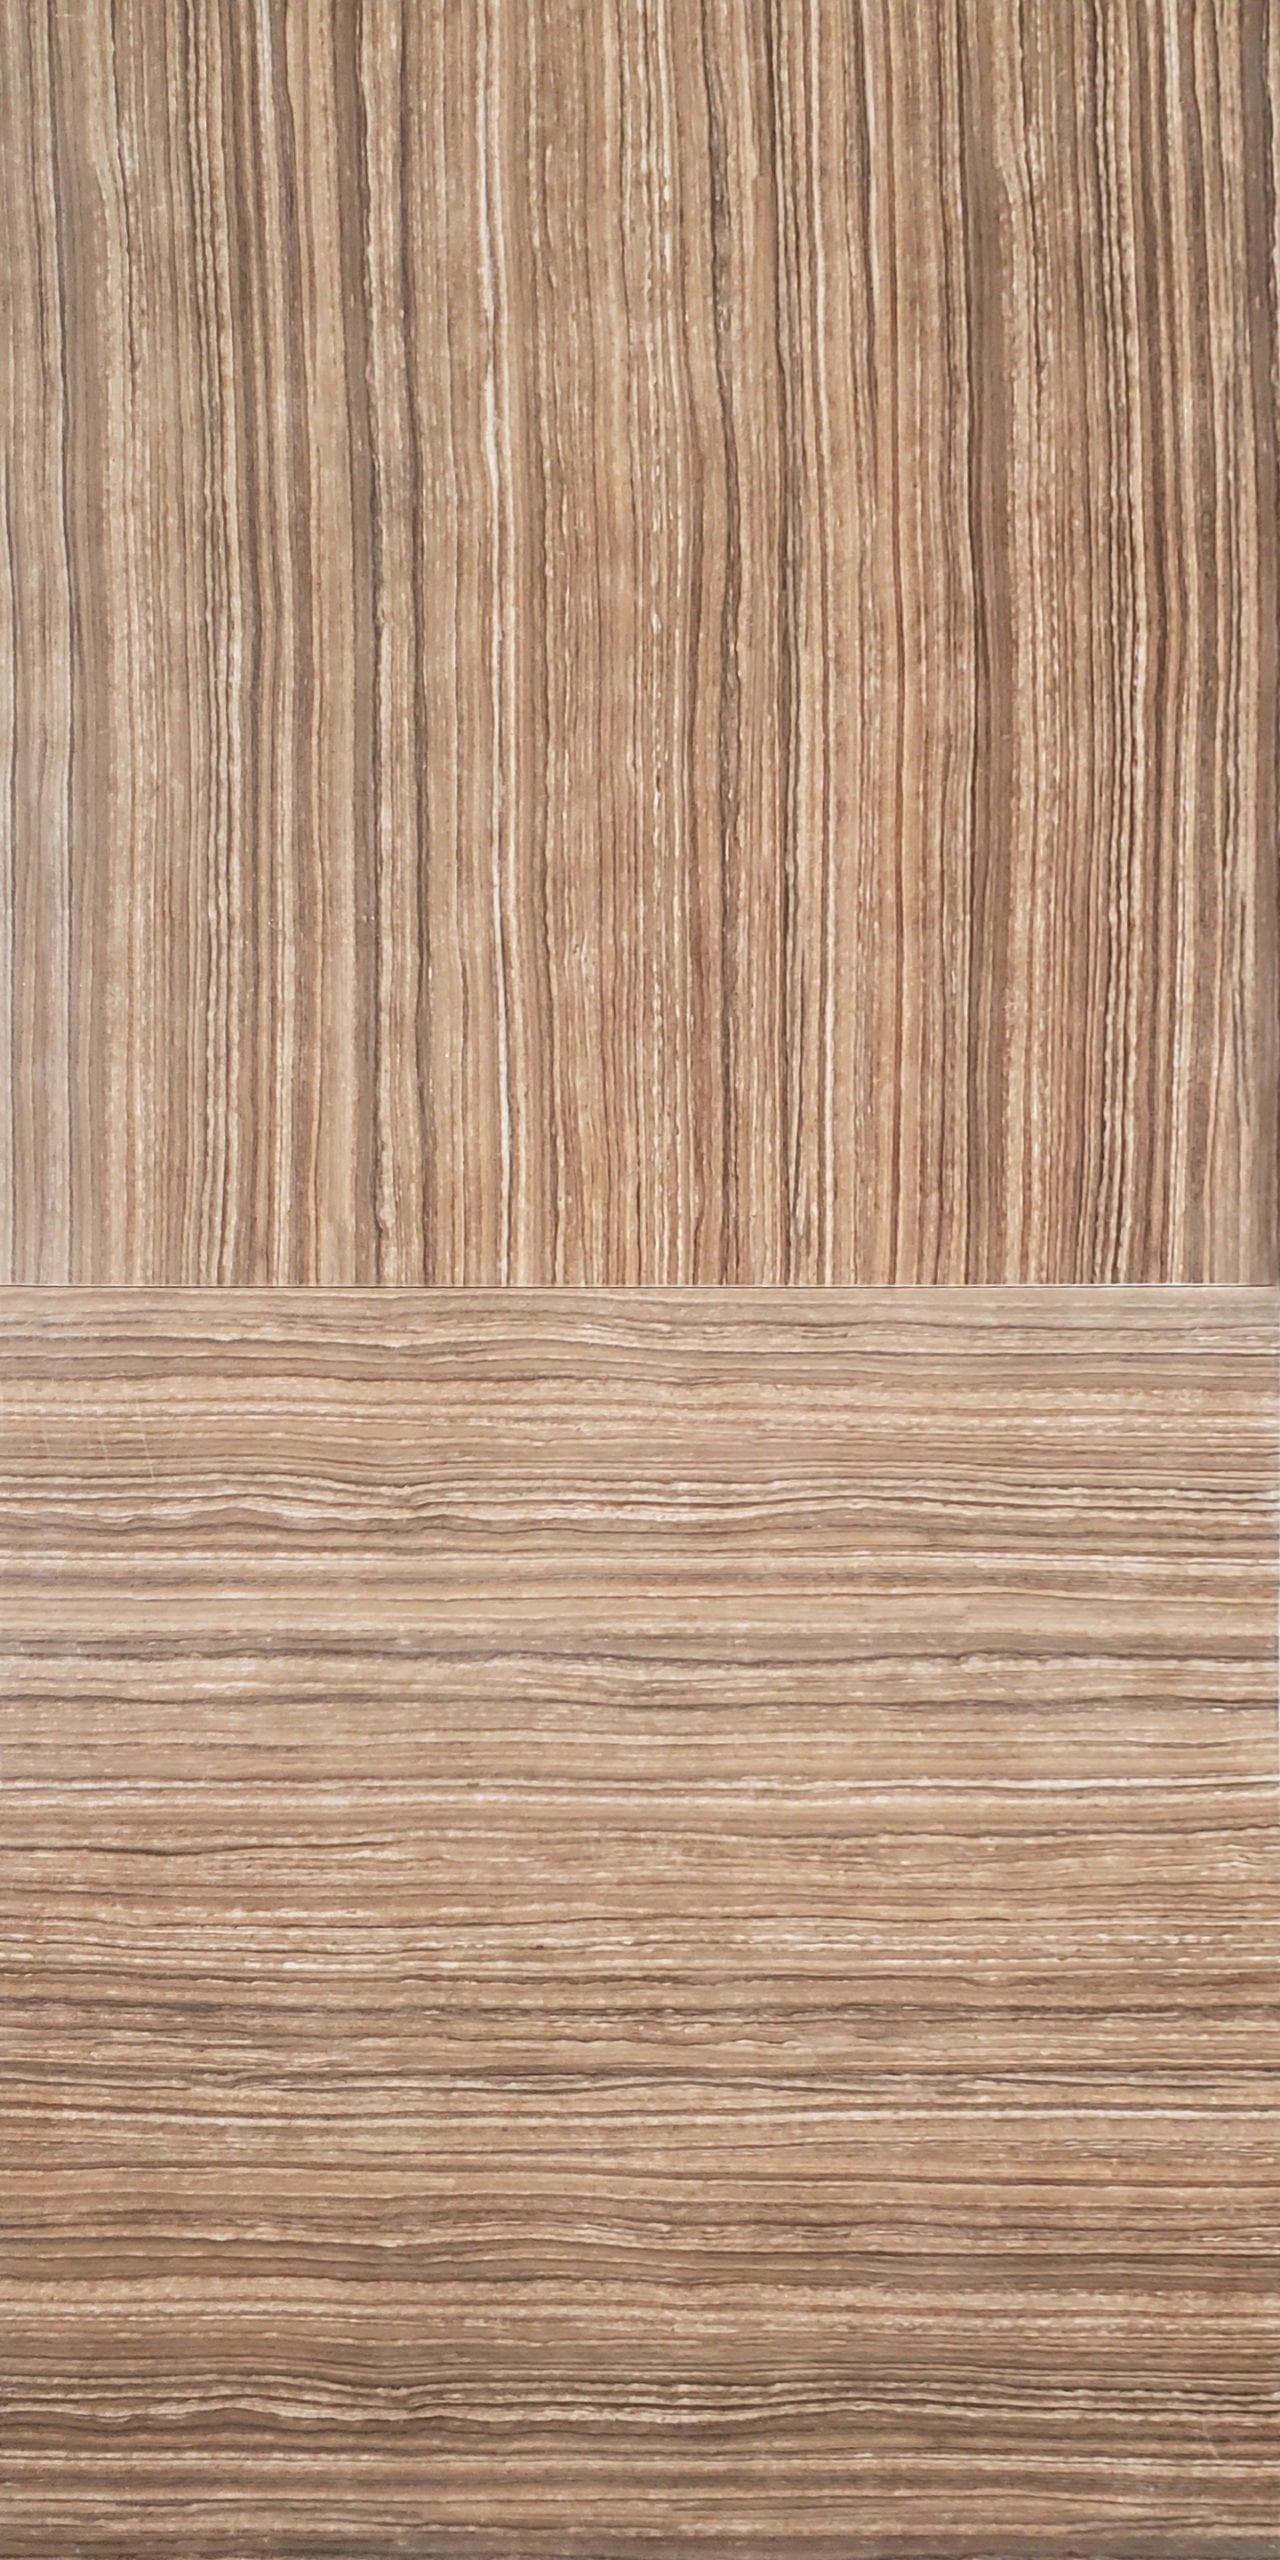 16×16 Bien Eramosa Polished_Brown-1.29